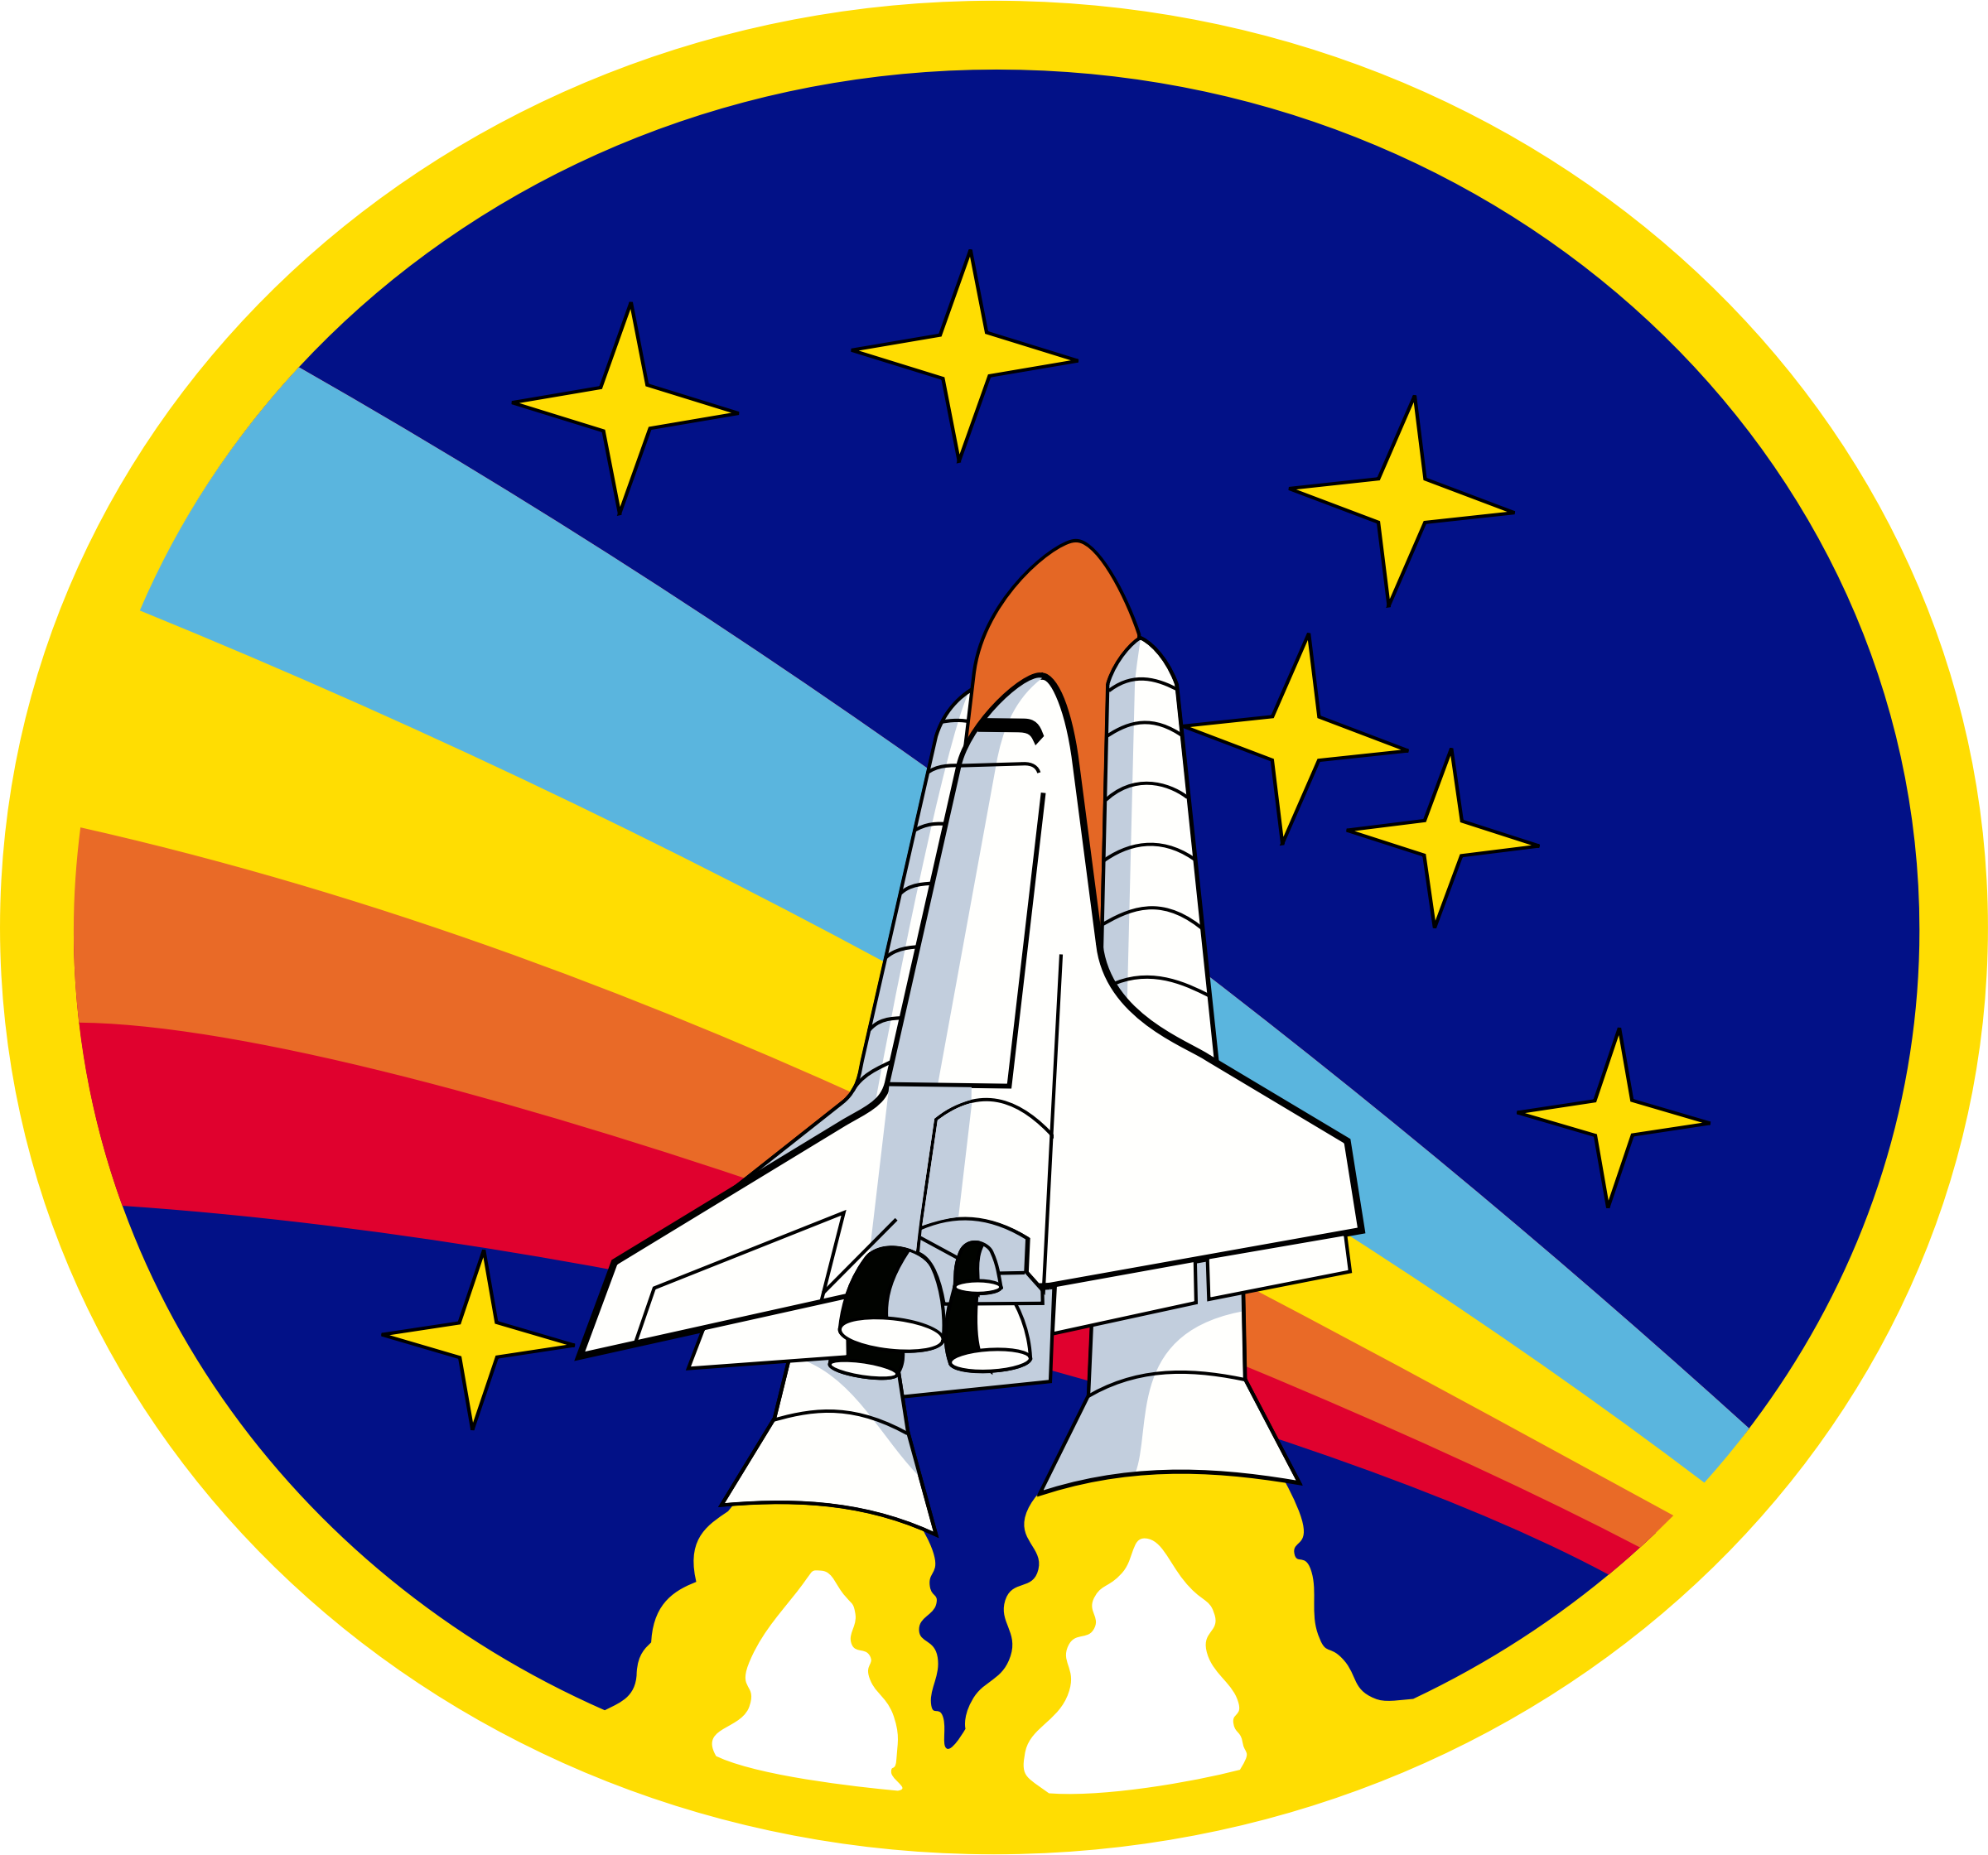 Rainbow shuttle big image. Clipart rocket logo